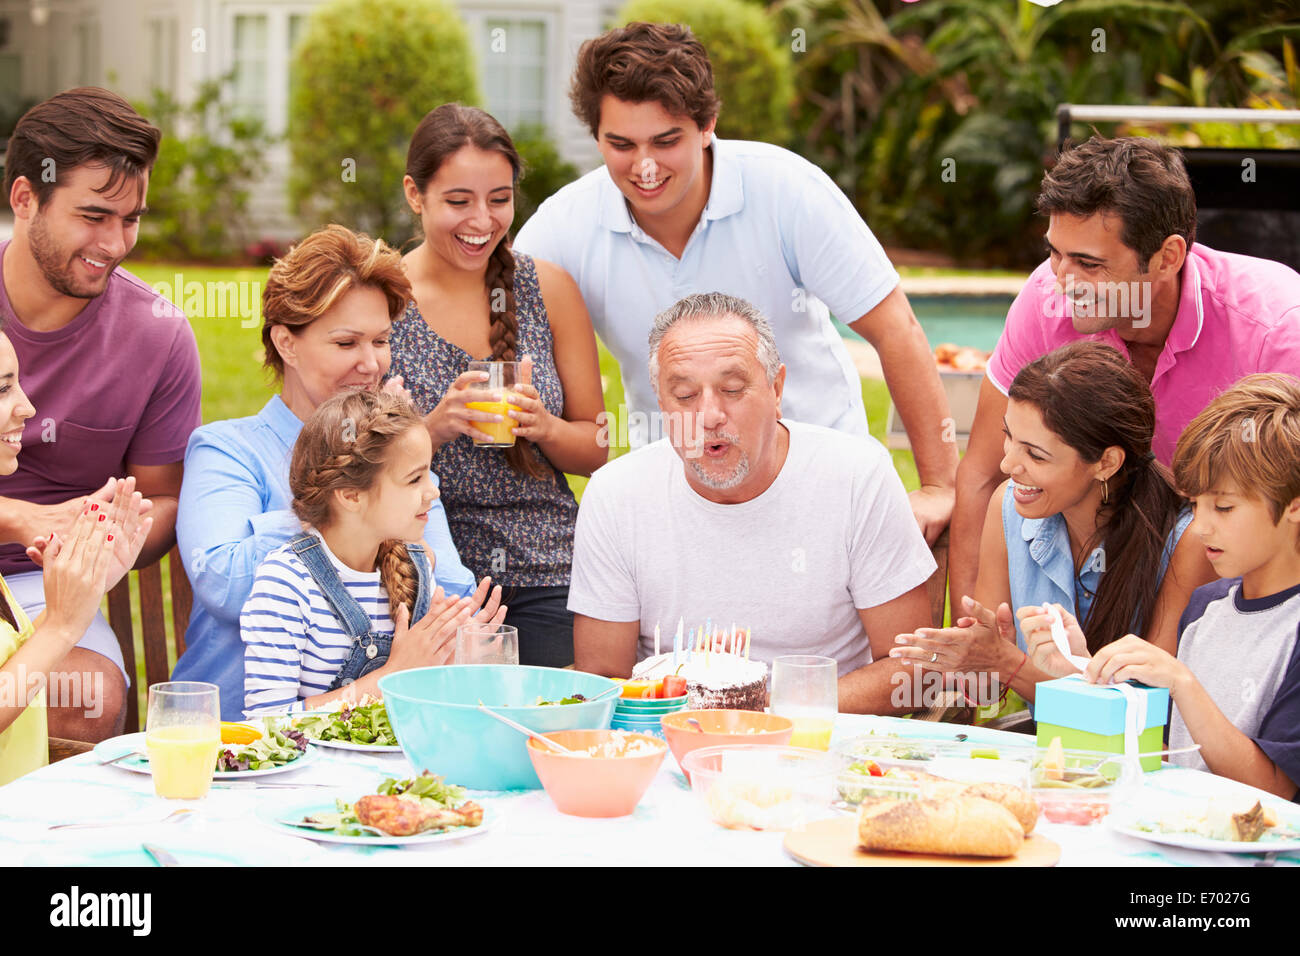 Multi Generation Family Celebrating Birthday In Garden Photo Stock